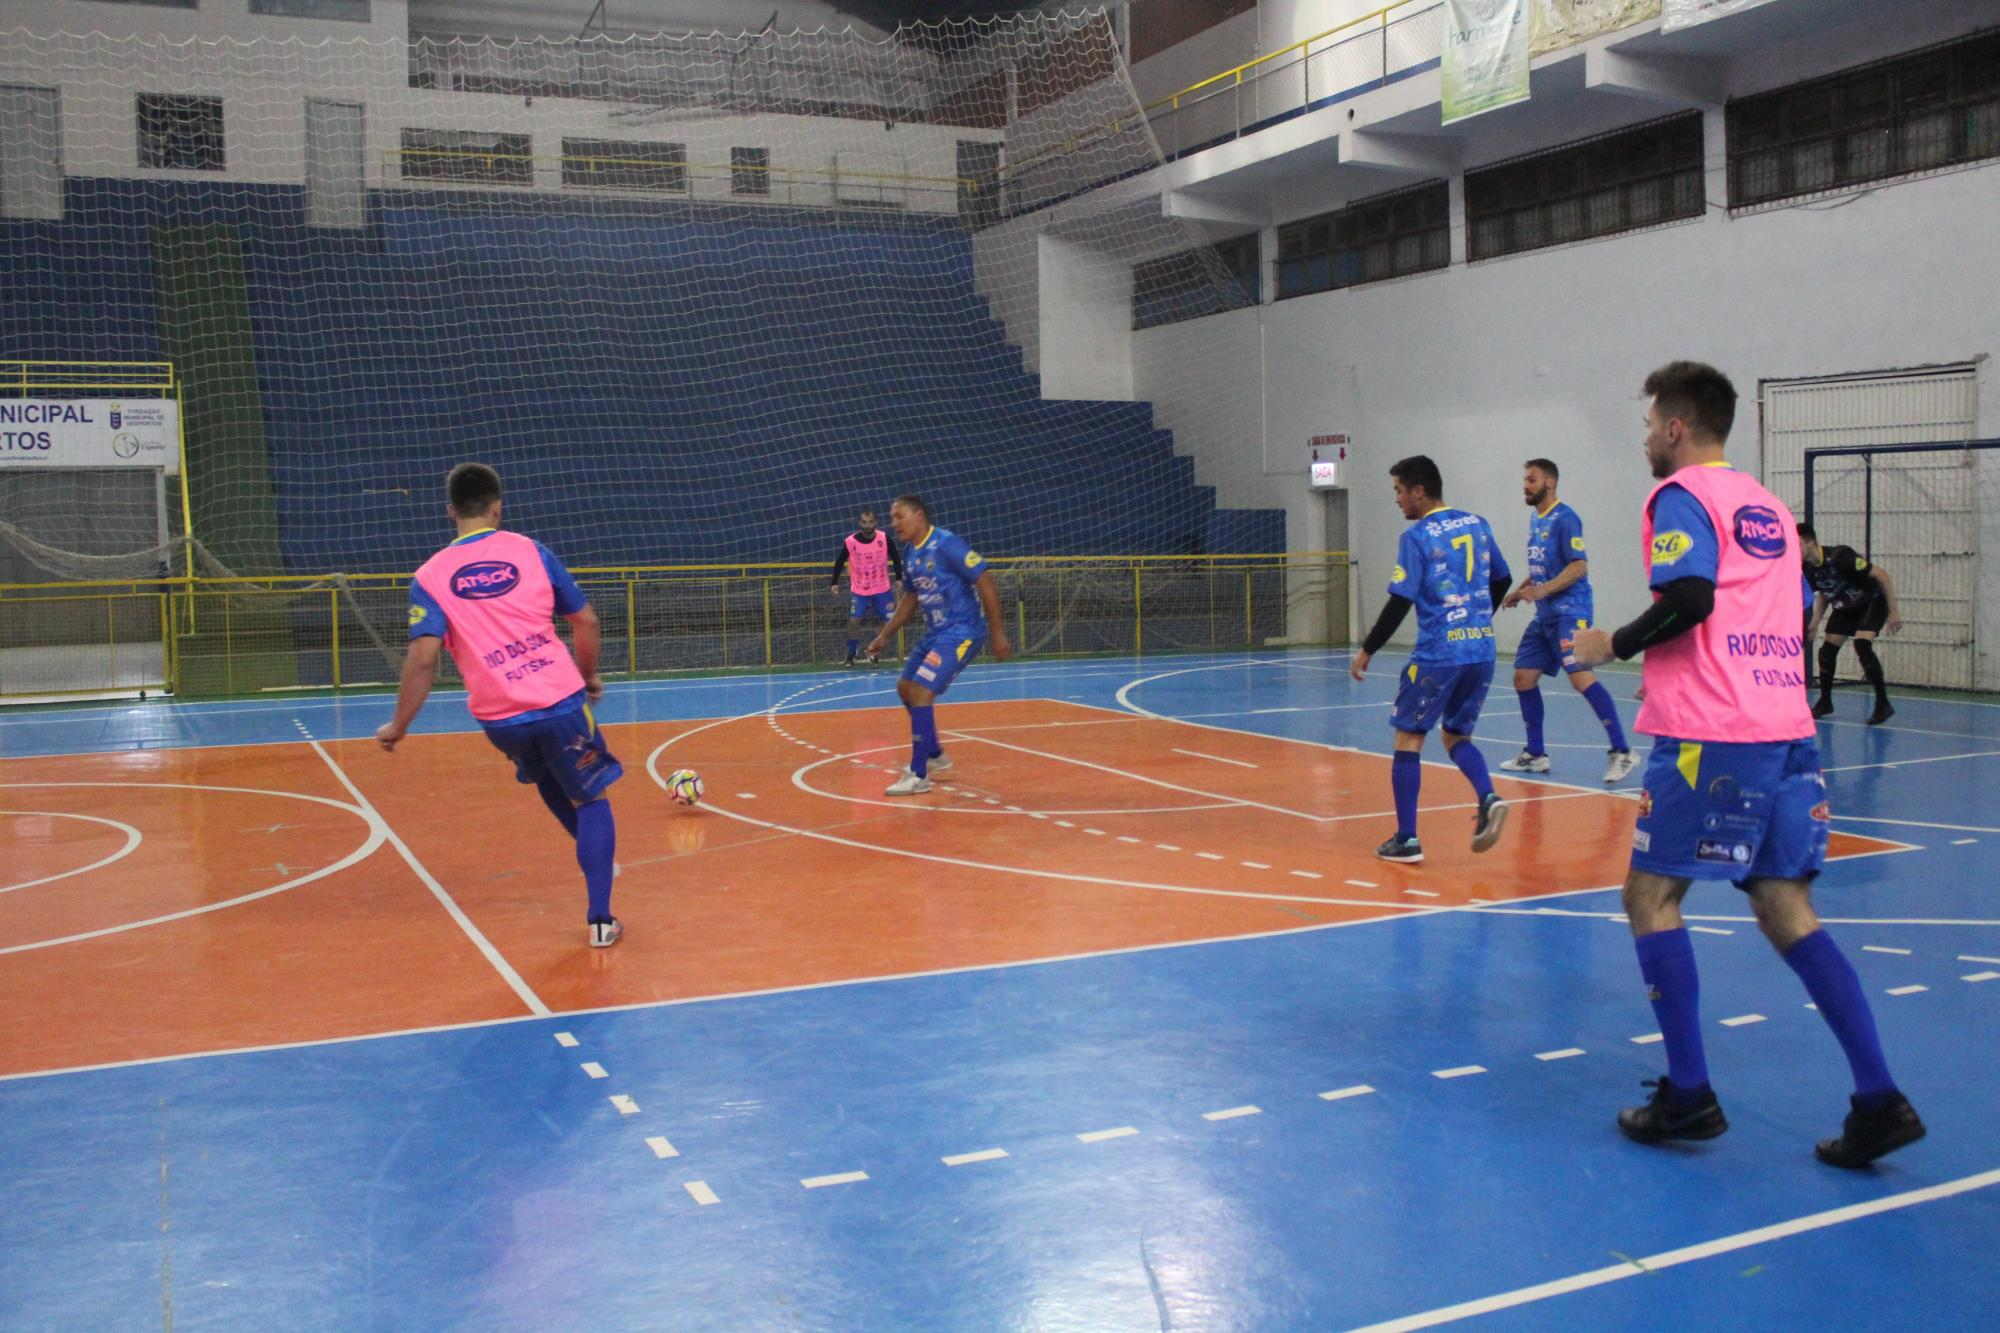 Rio do Sul Futsal recebe Catanduvas pela segunda rodada da Liga Catarinense de Futsal